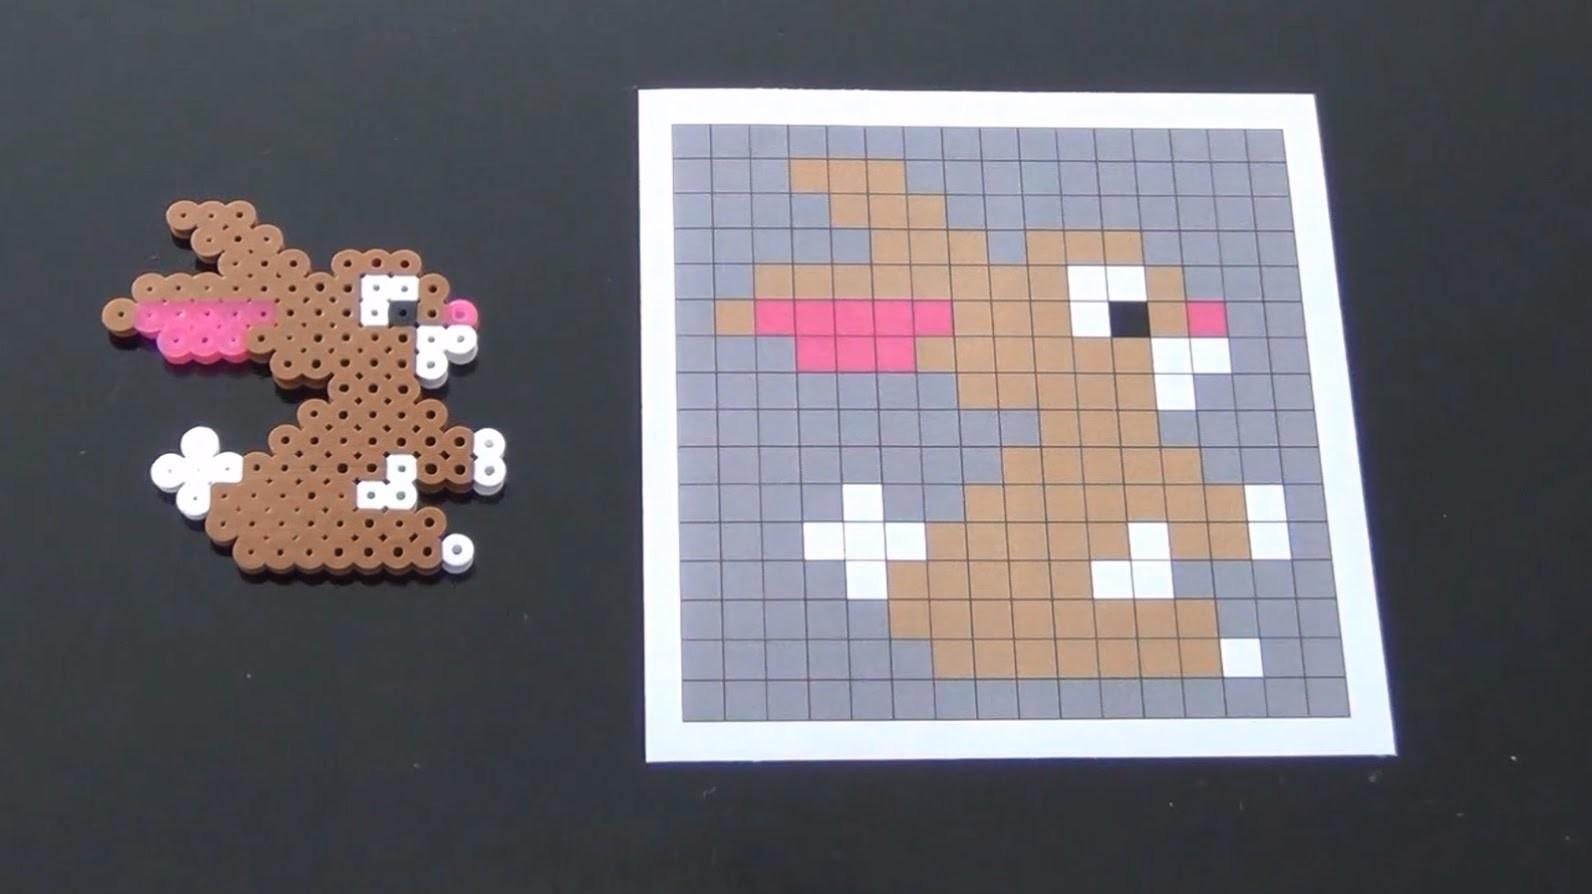 How to Make a Cute Perler Bead Bunny